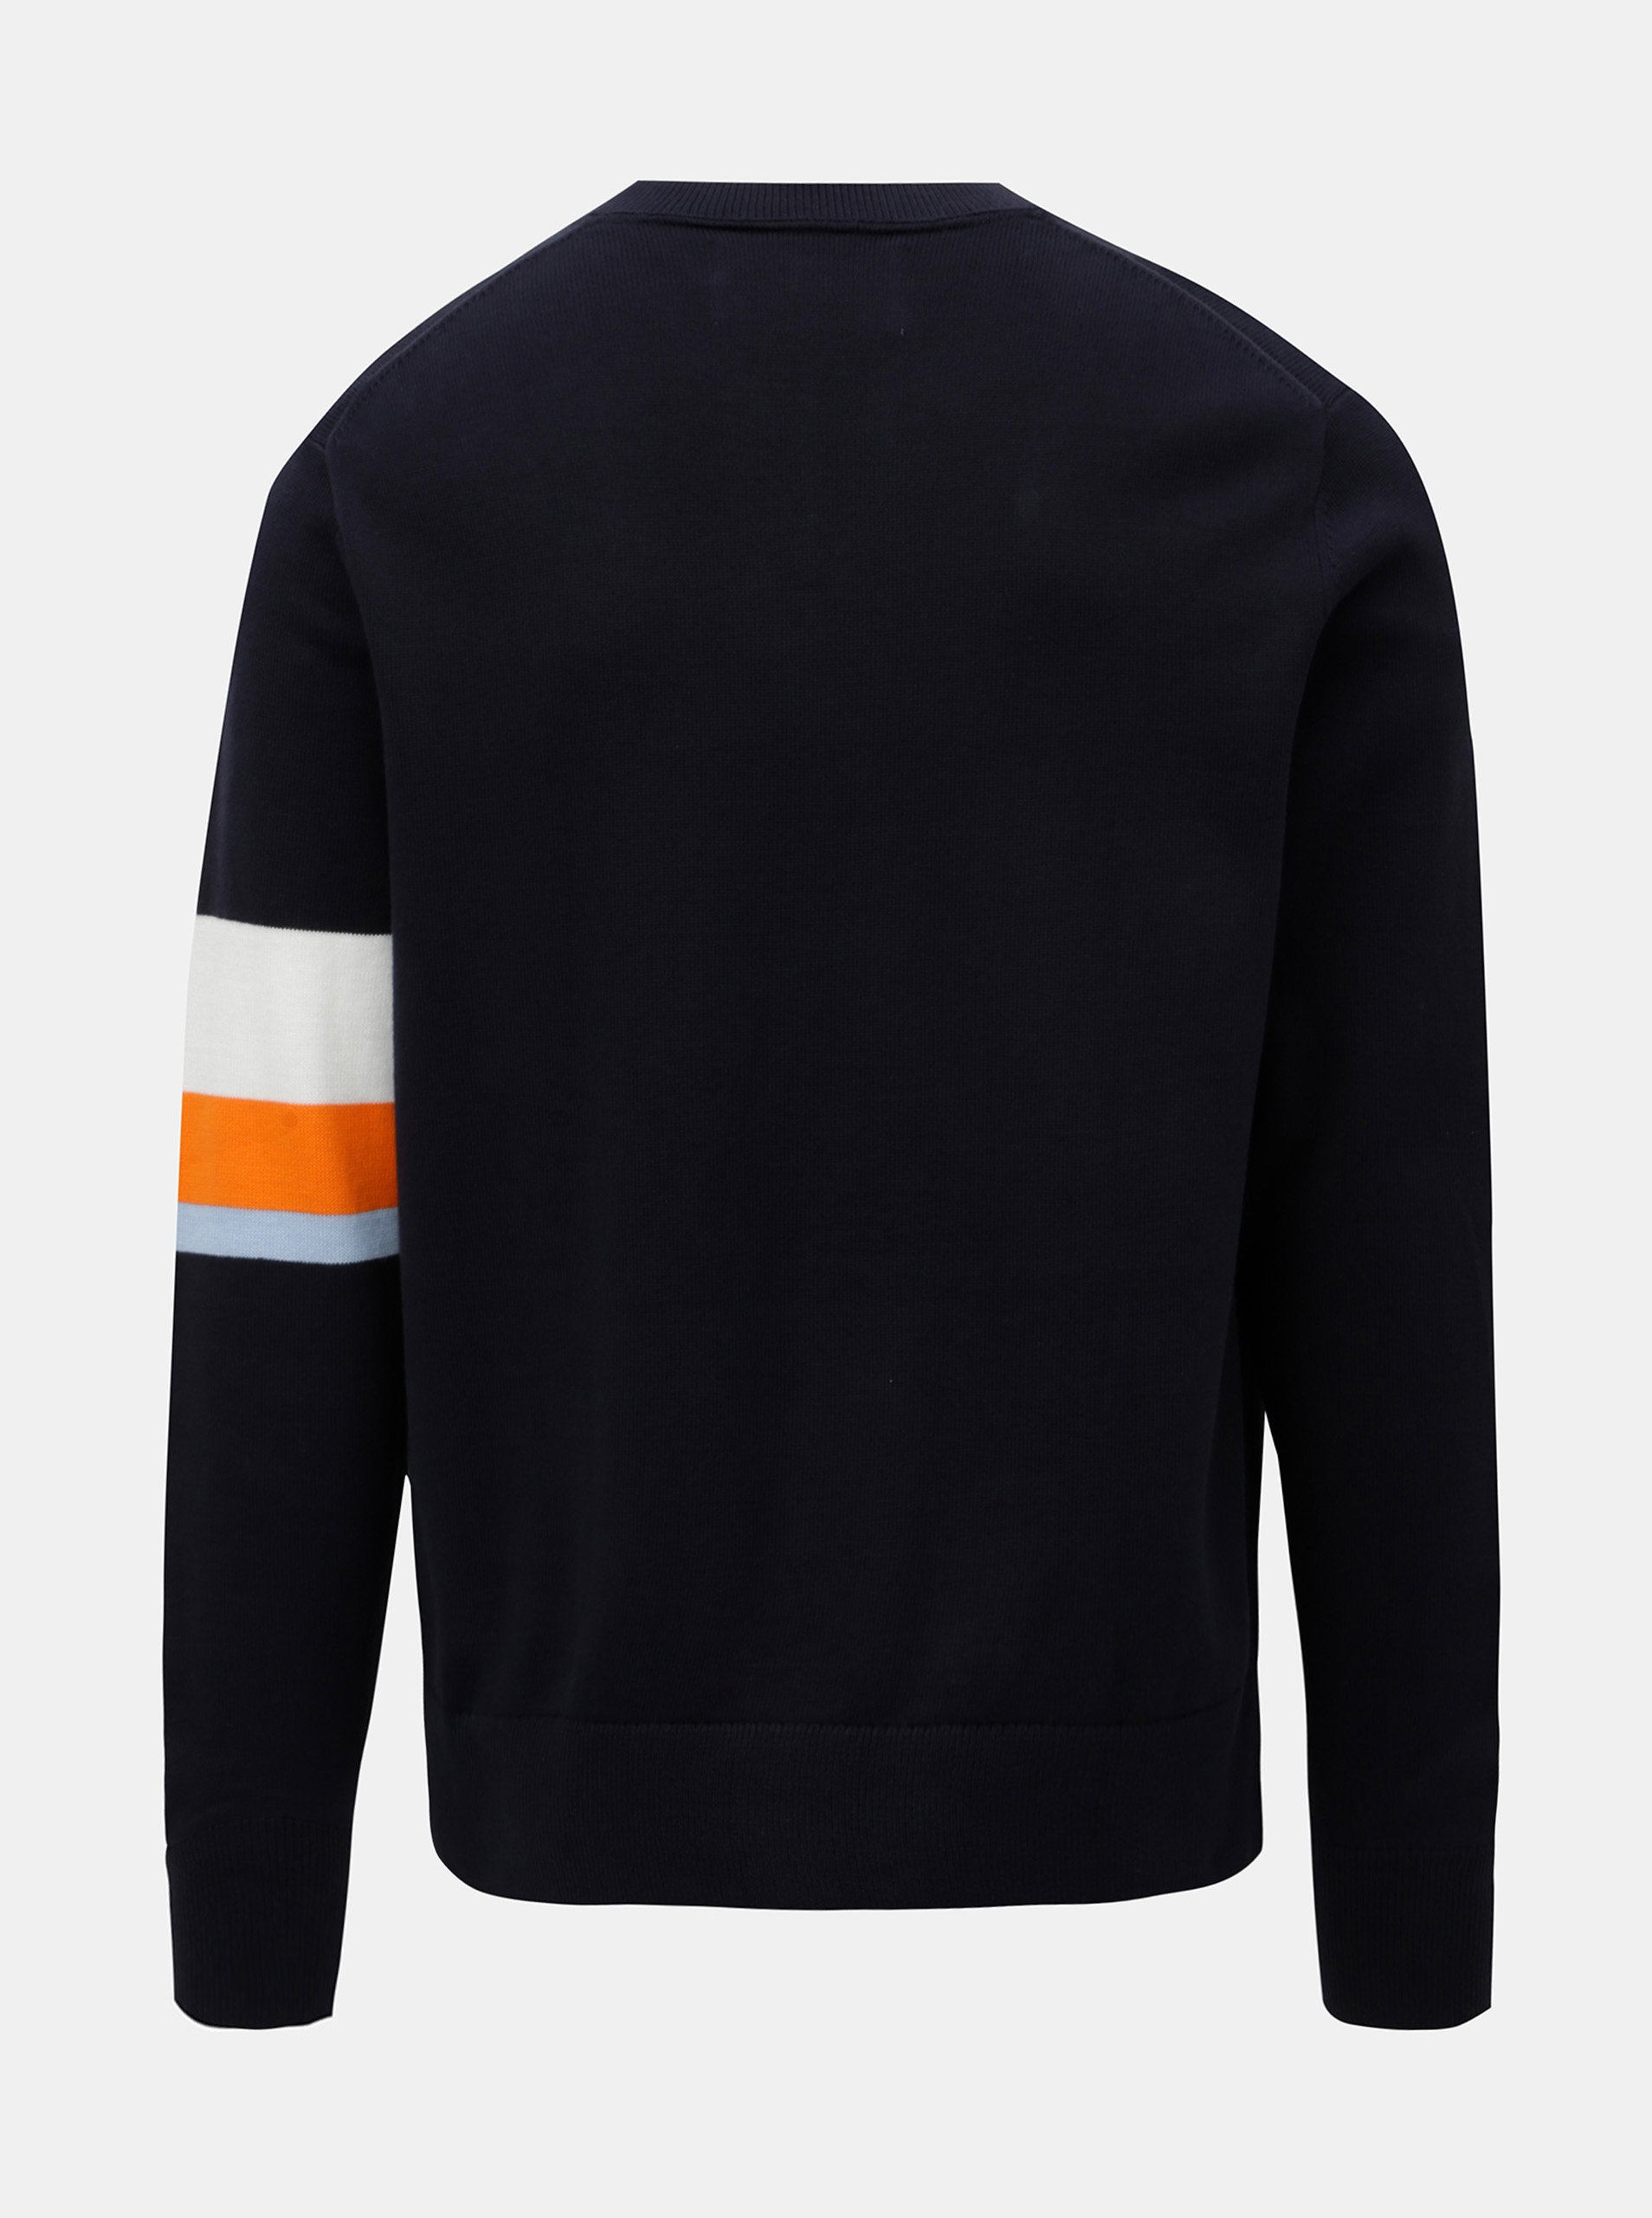 13e7b9dfb2 Tmavomodrý pánsky sveter s pruhmi Calvin Klein Jeans ...